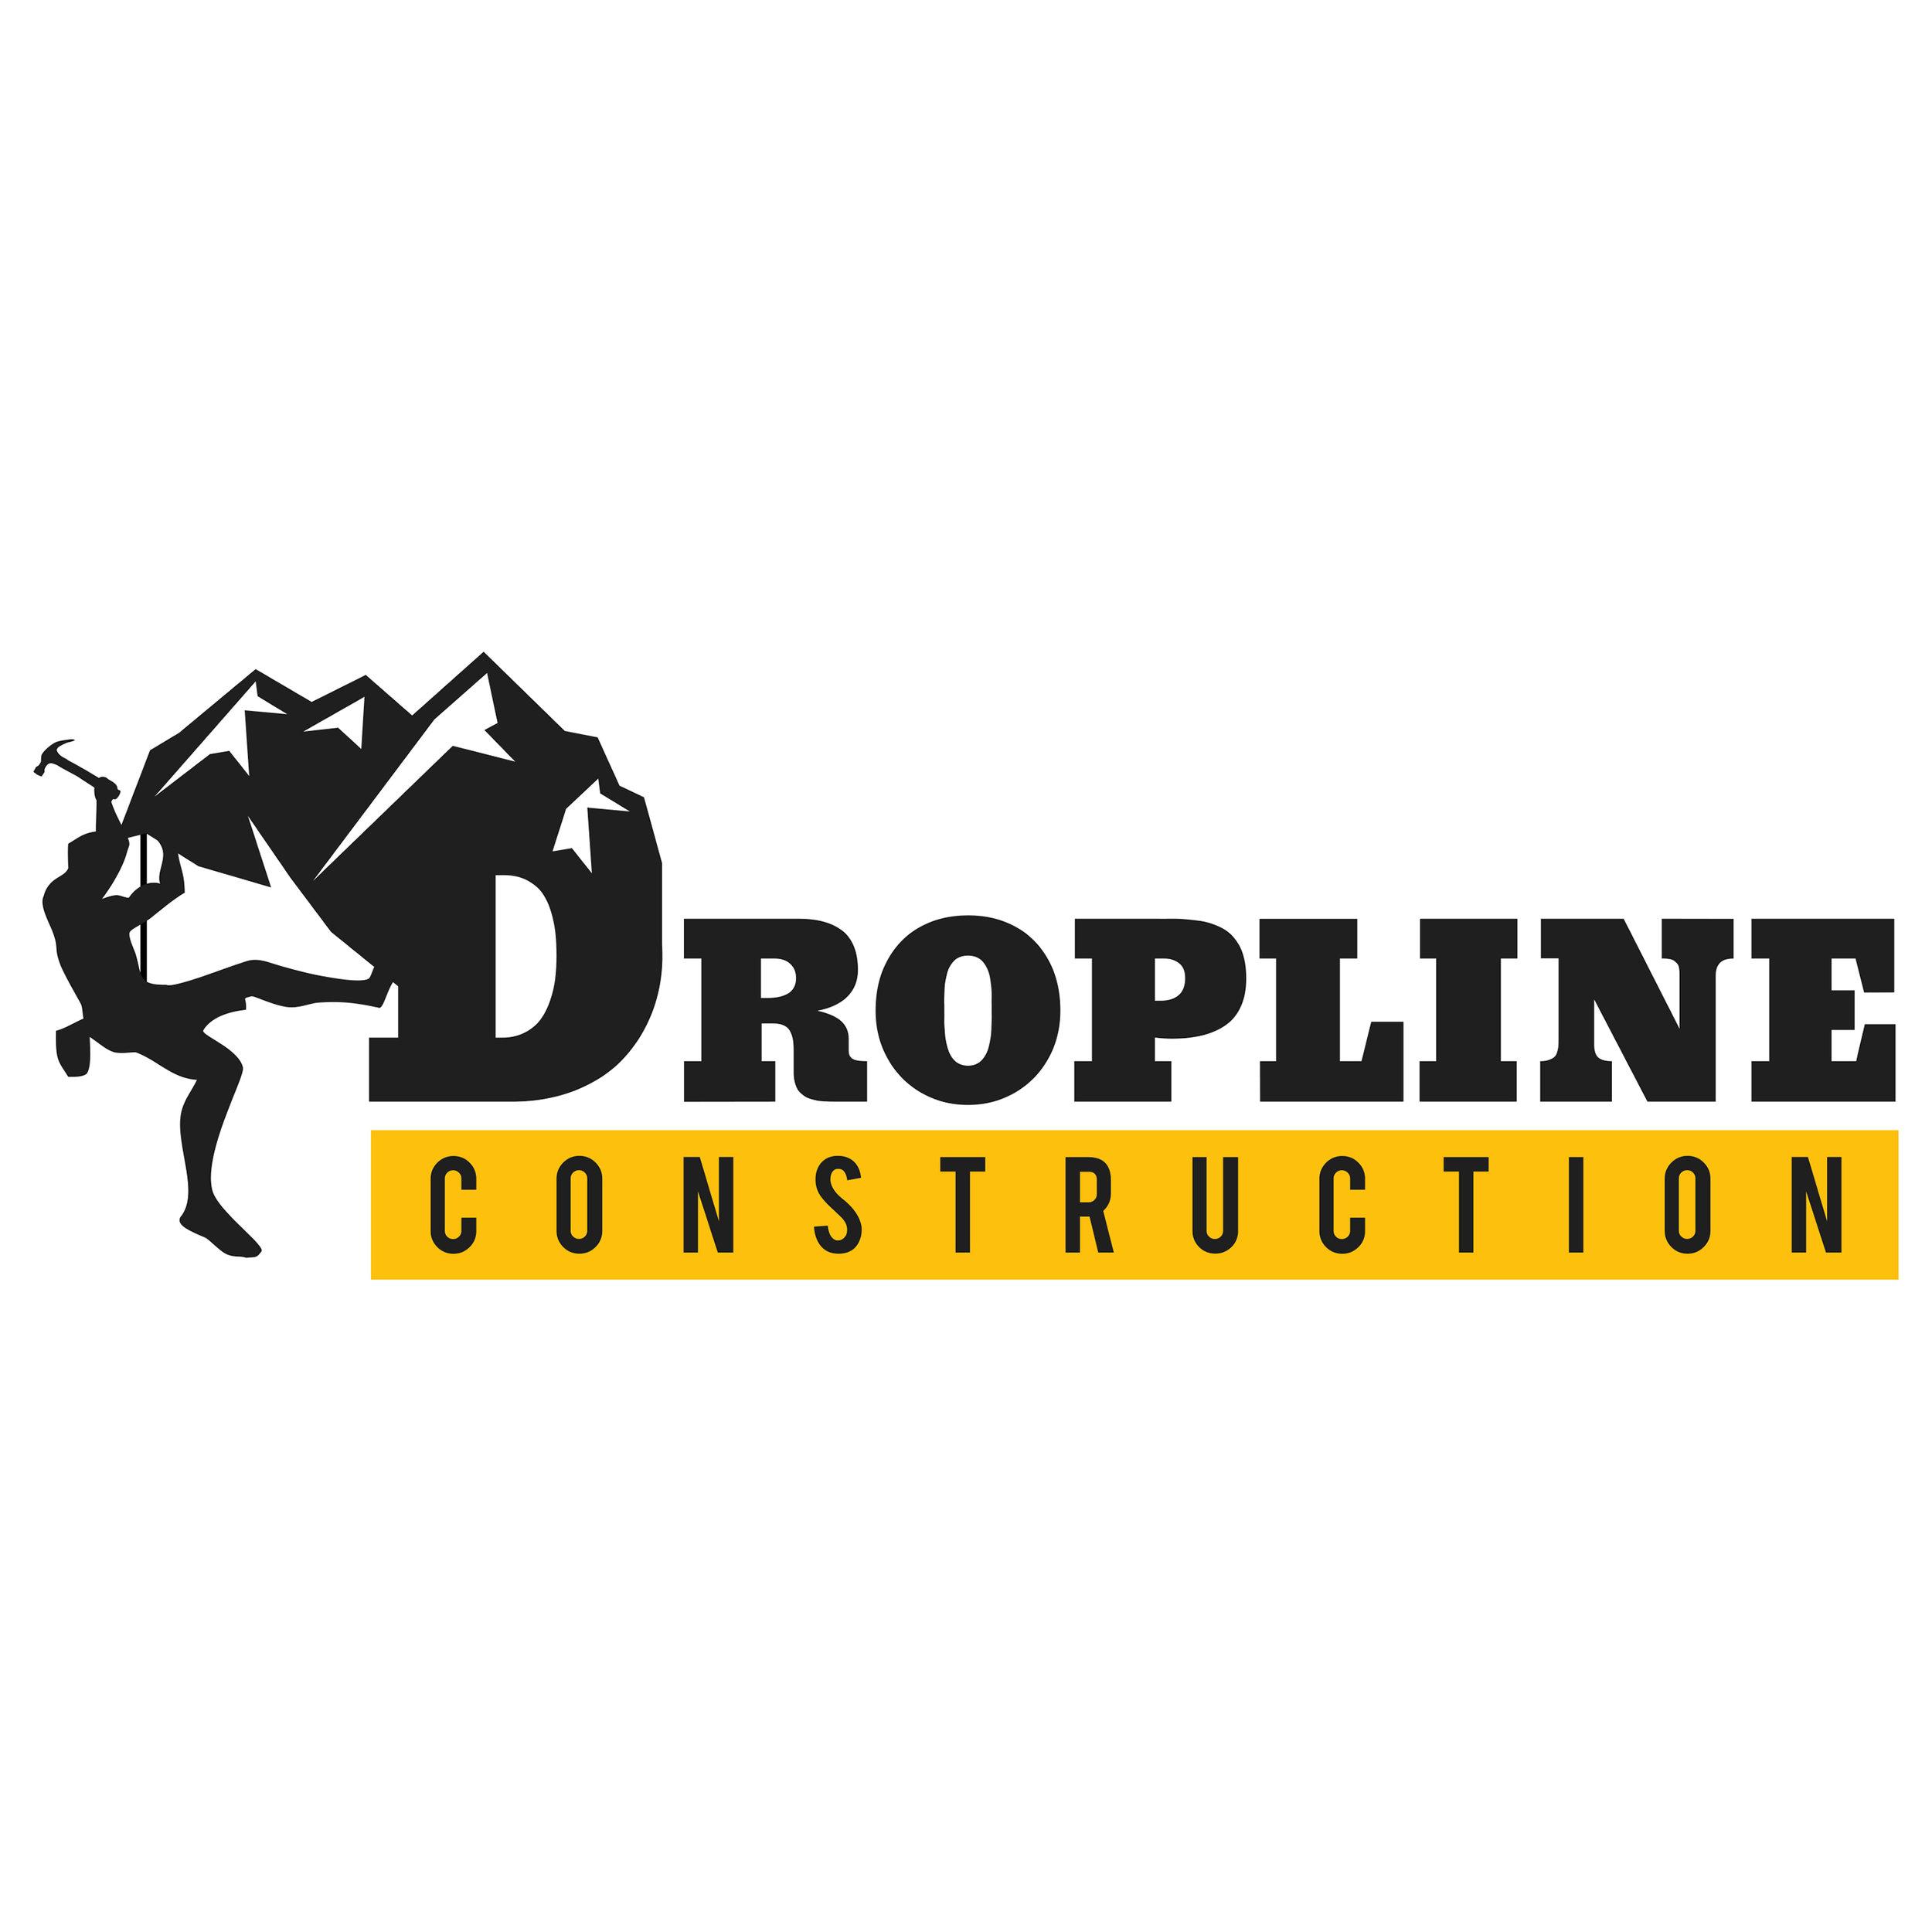 DroplineConstructionWeb.jpg